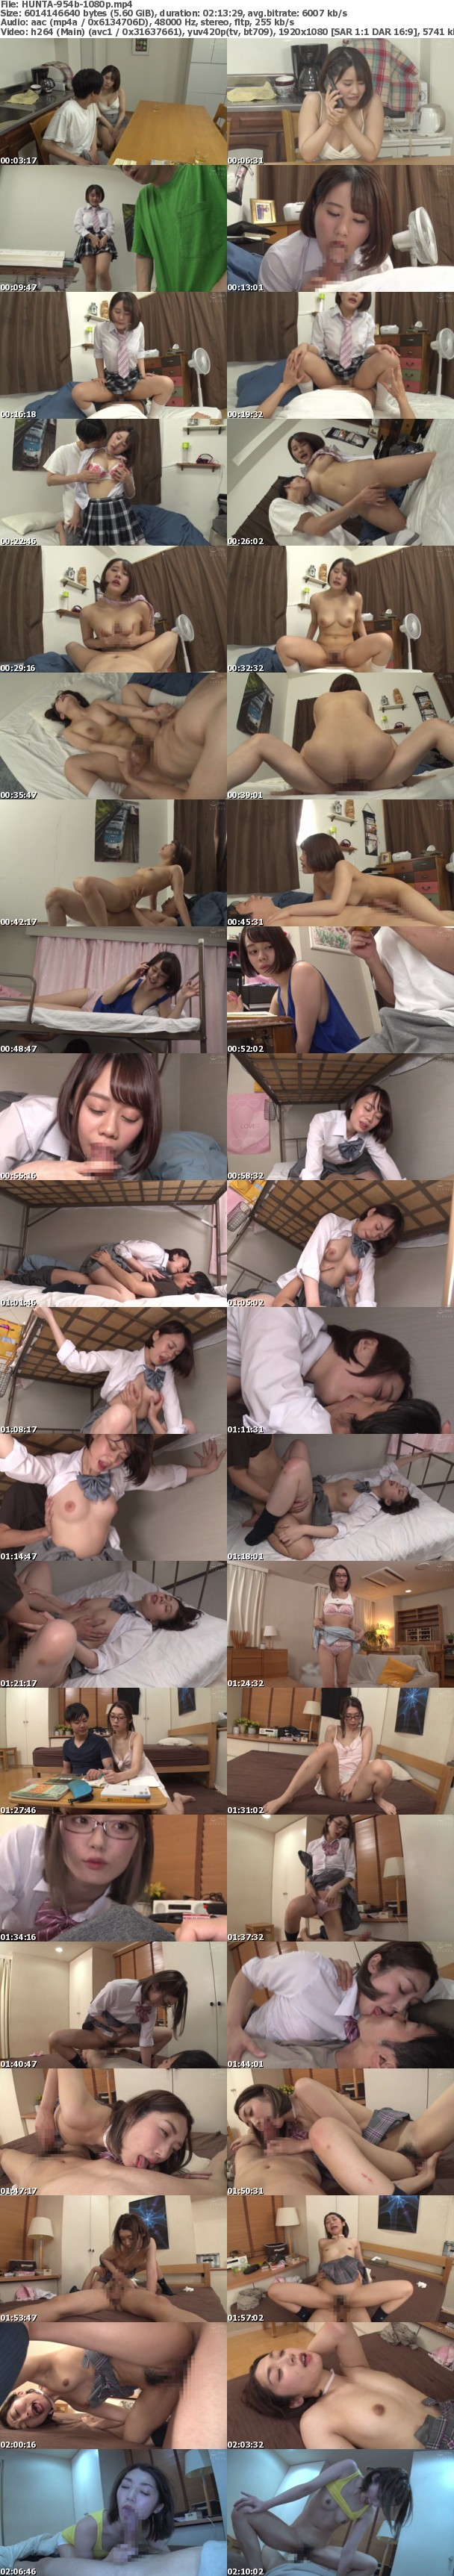 (Full HD) HUNTA-954 『ちょっとお前何してるんだよ!』目を覚ましたら妹がボクの上で勝手にイキまくり!ヤリマン予備軍の妹は超性欲モンスター!最近エッチ覚えたての妹…